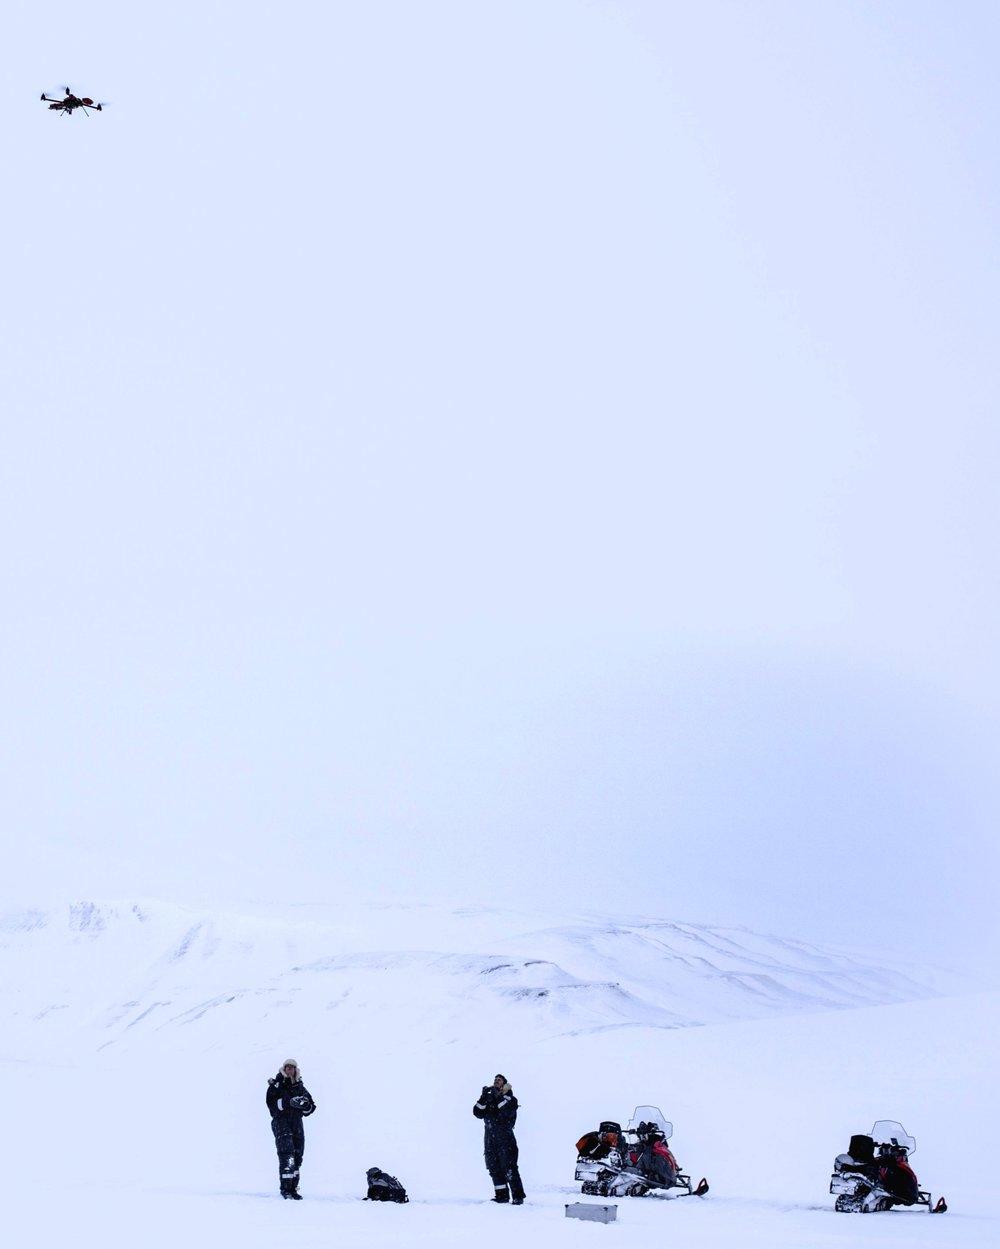 Test flights during a pilot study in Svalbard in 2017 (ph Marc latzel/Rolex)